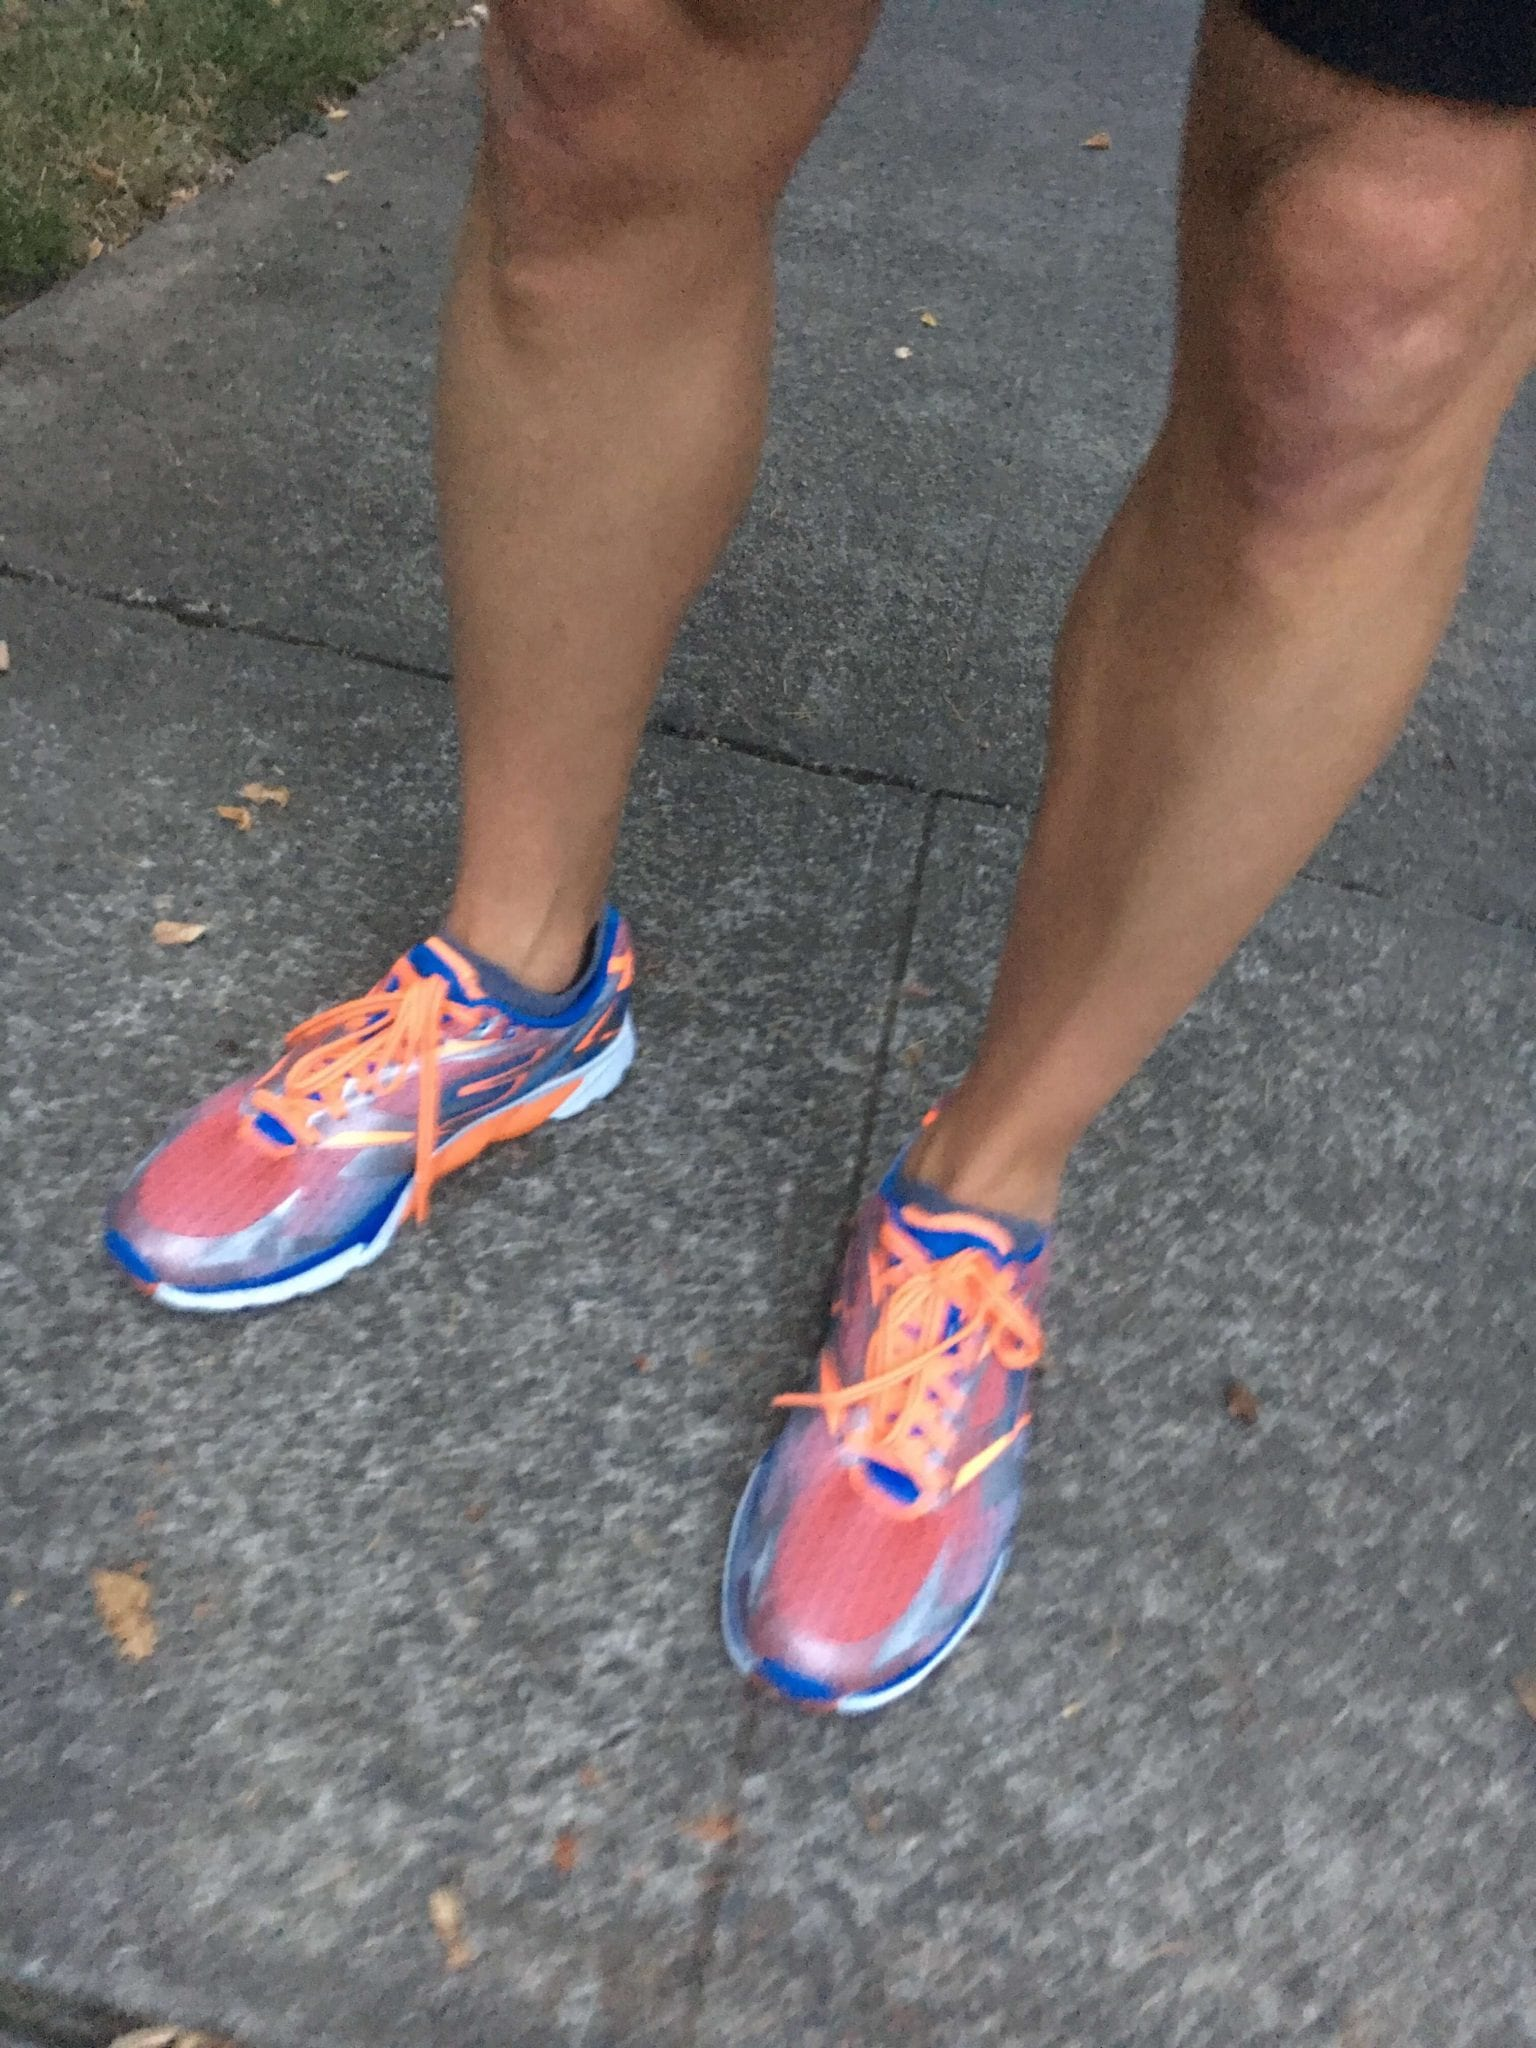 Skechers Gorun4 Onfoot